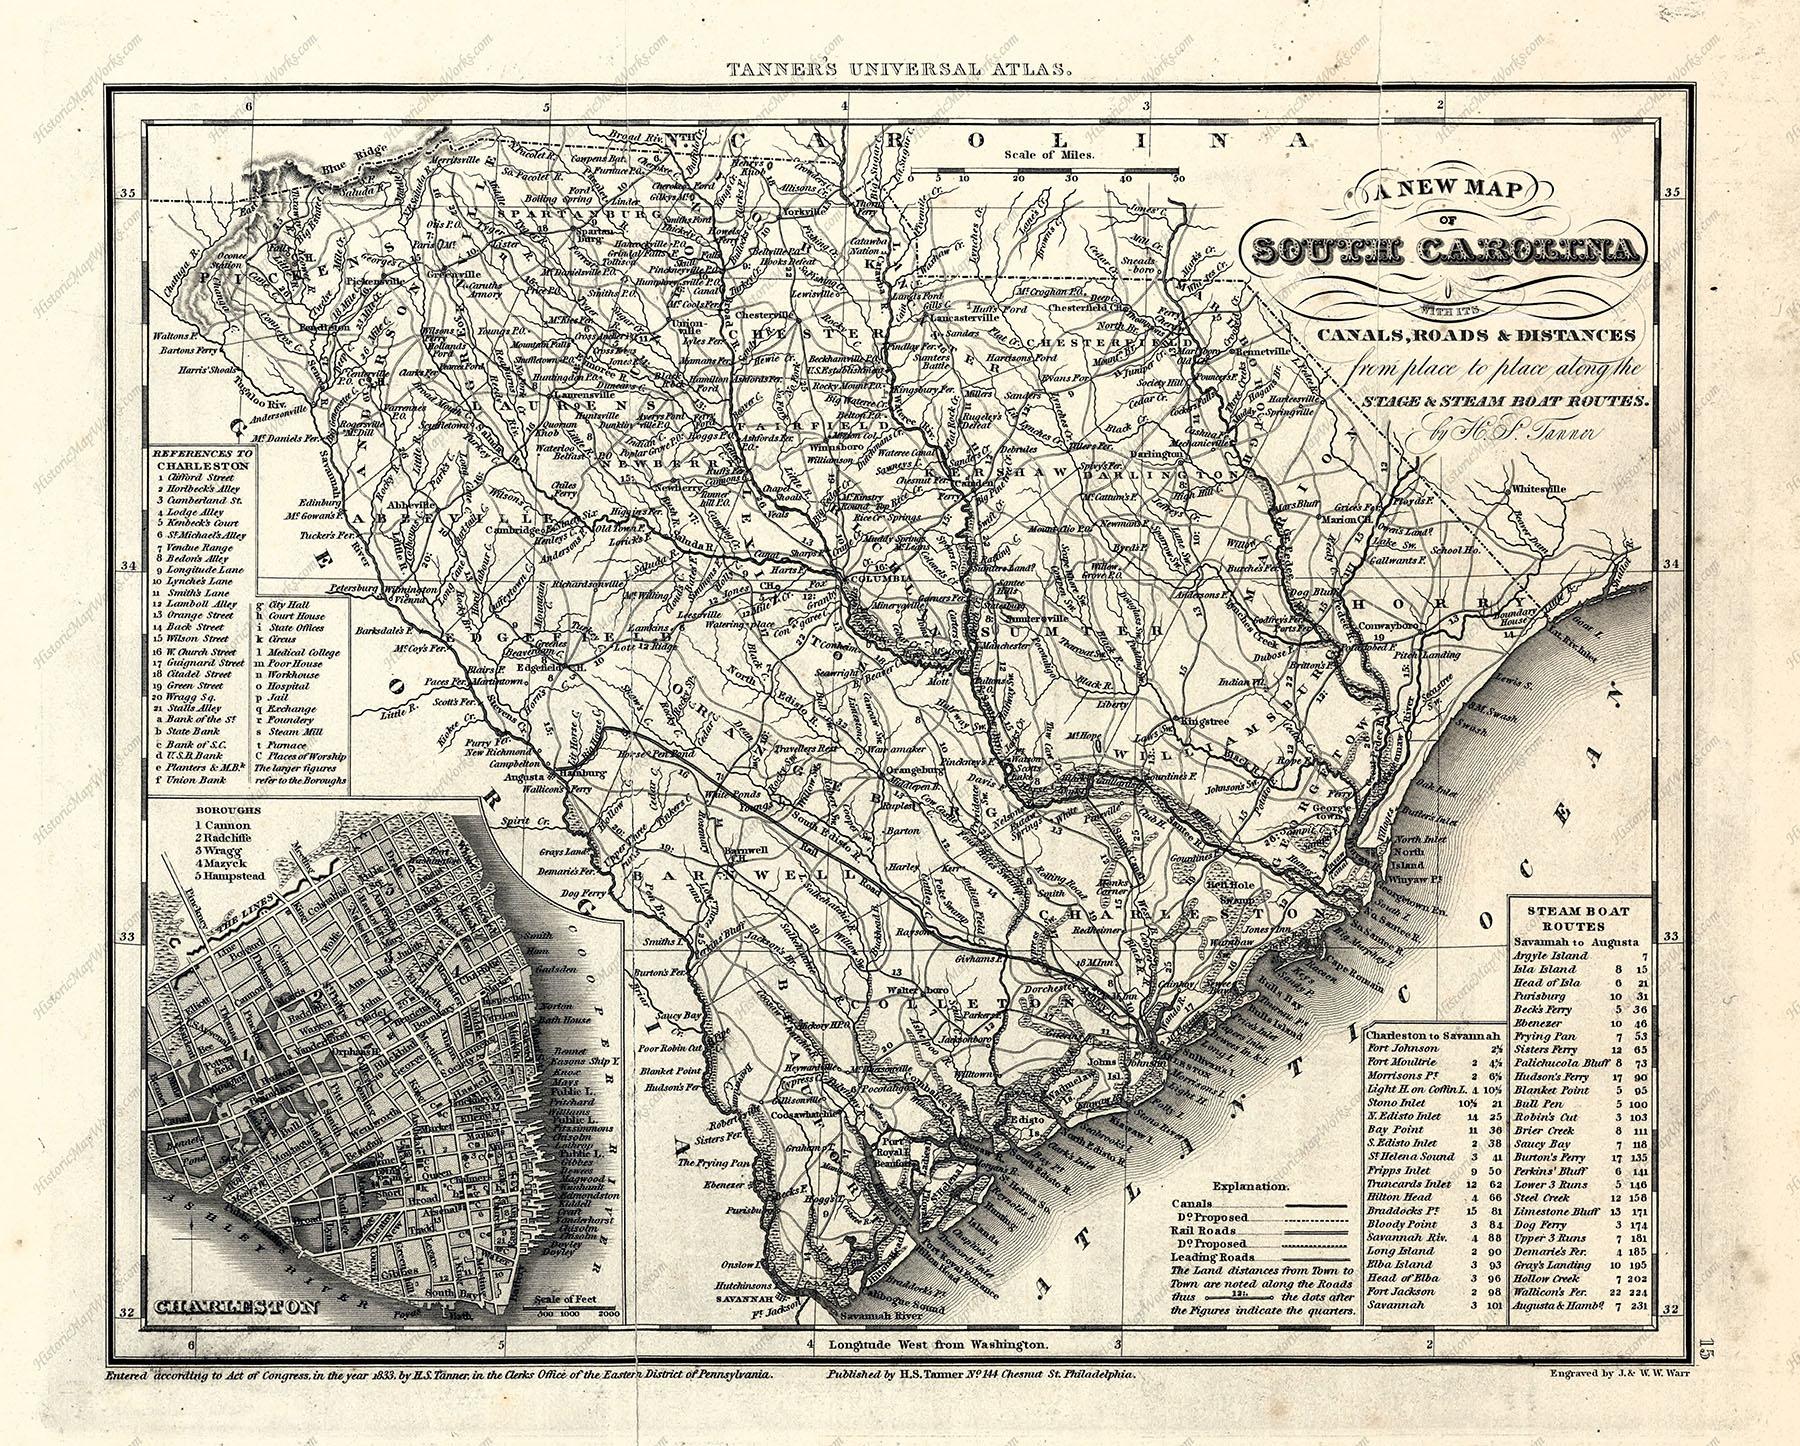 South_Carolina_1833_Railroad_and_Transport_Map_1800.jpg